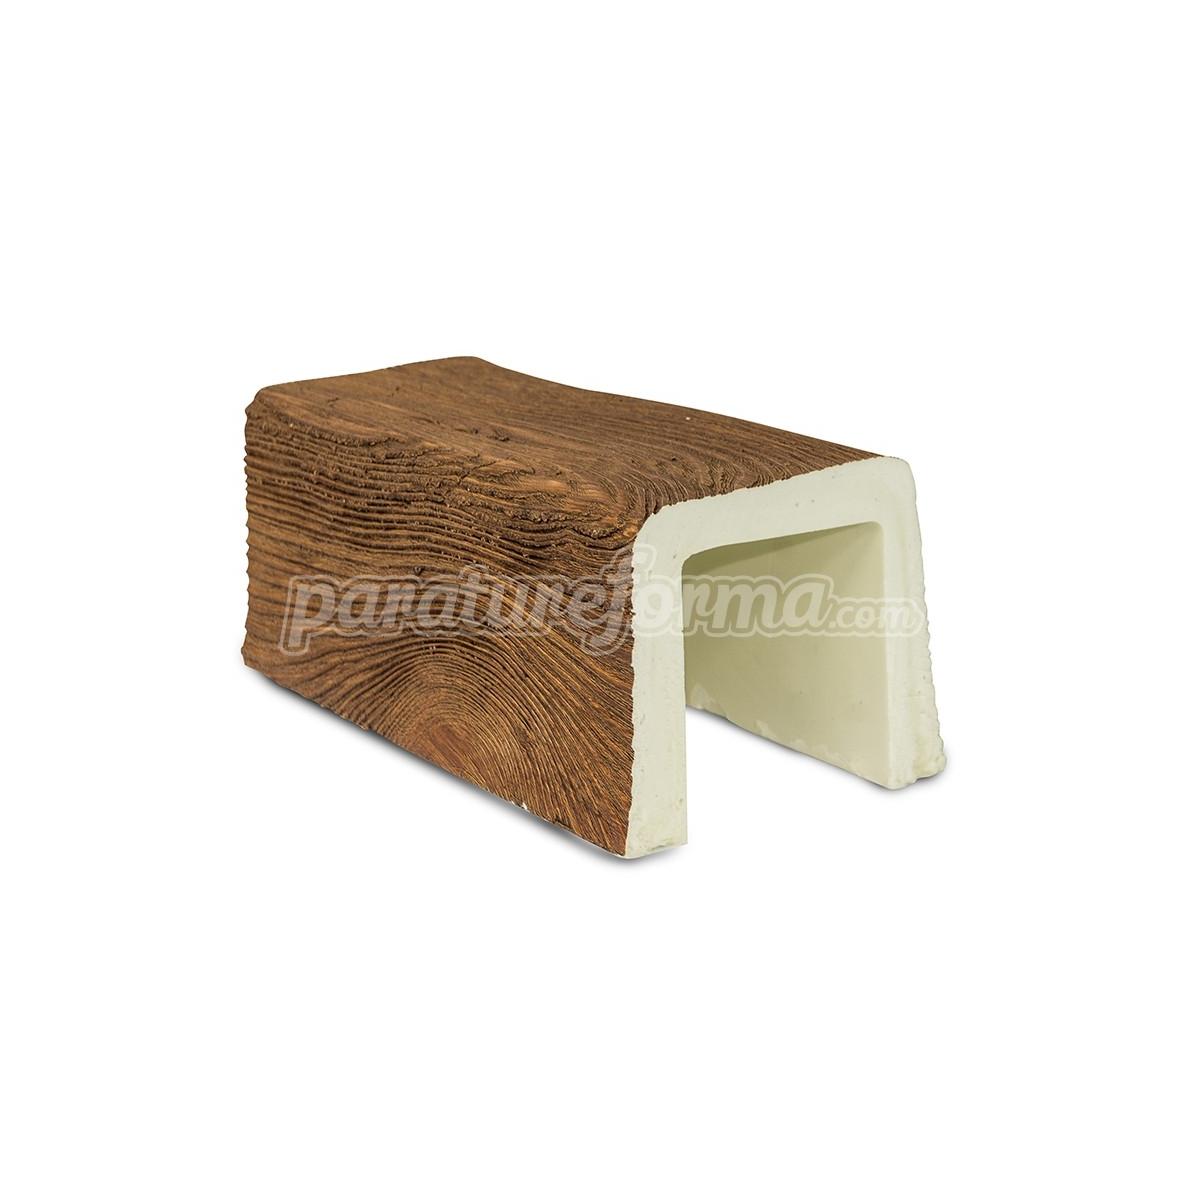 Viga imitación a madera 300x12x12 - Vigas imitación madera cuadradas